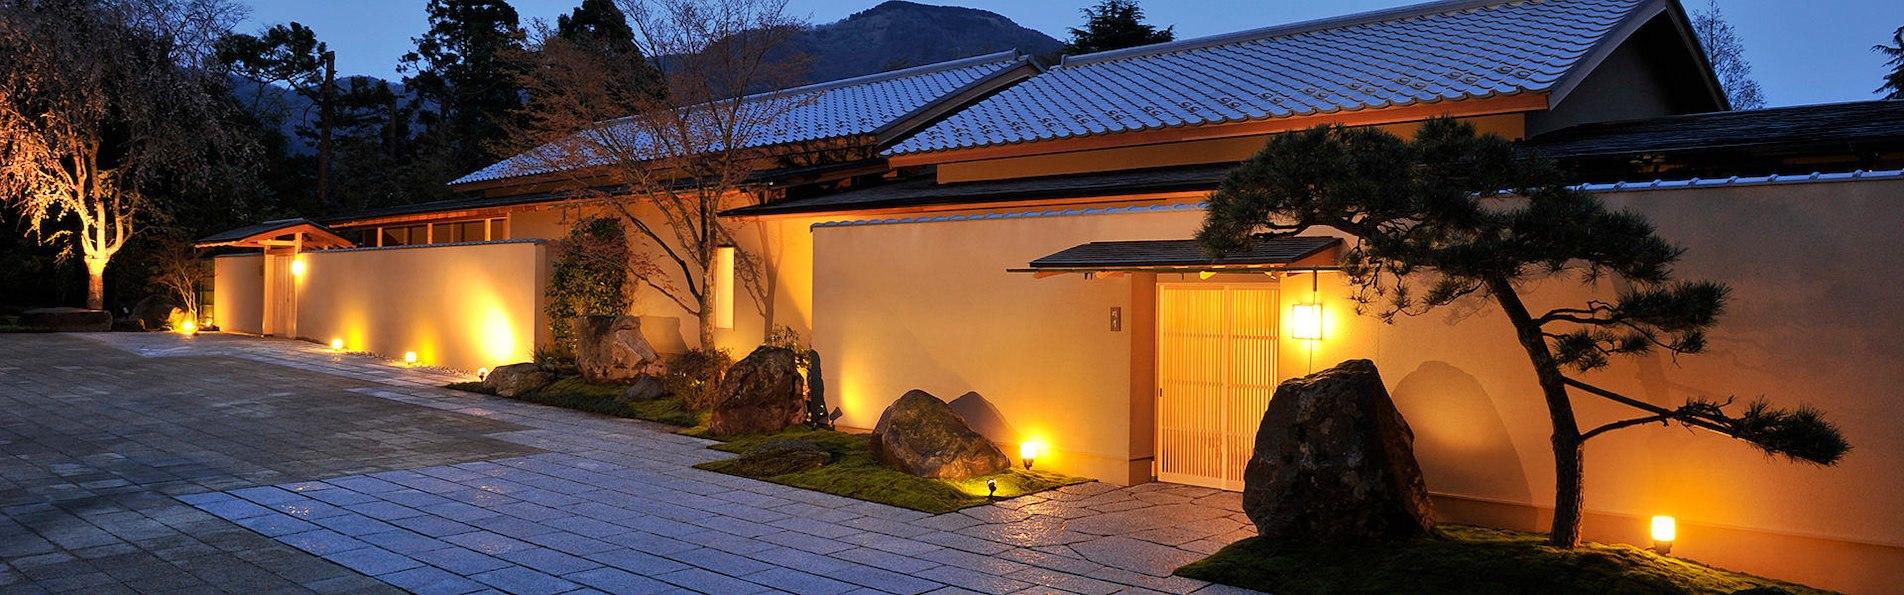 gora-kadan-hakone-japan